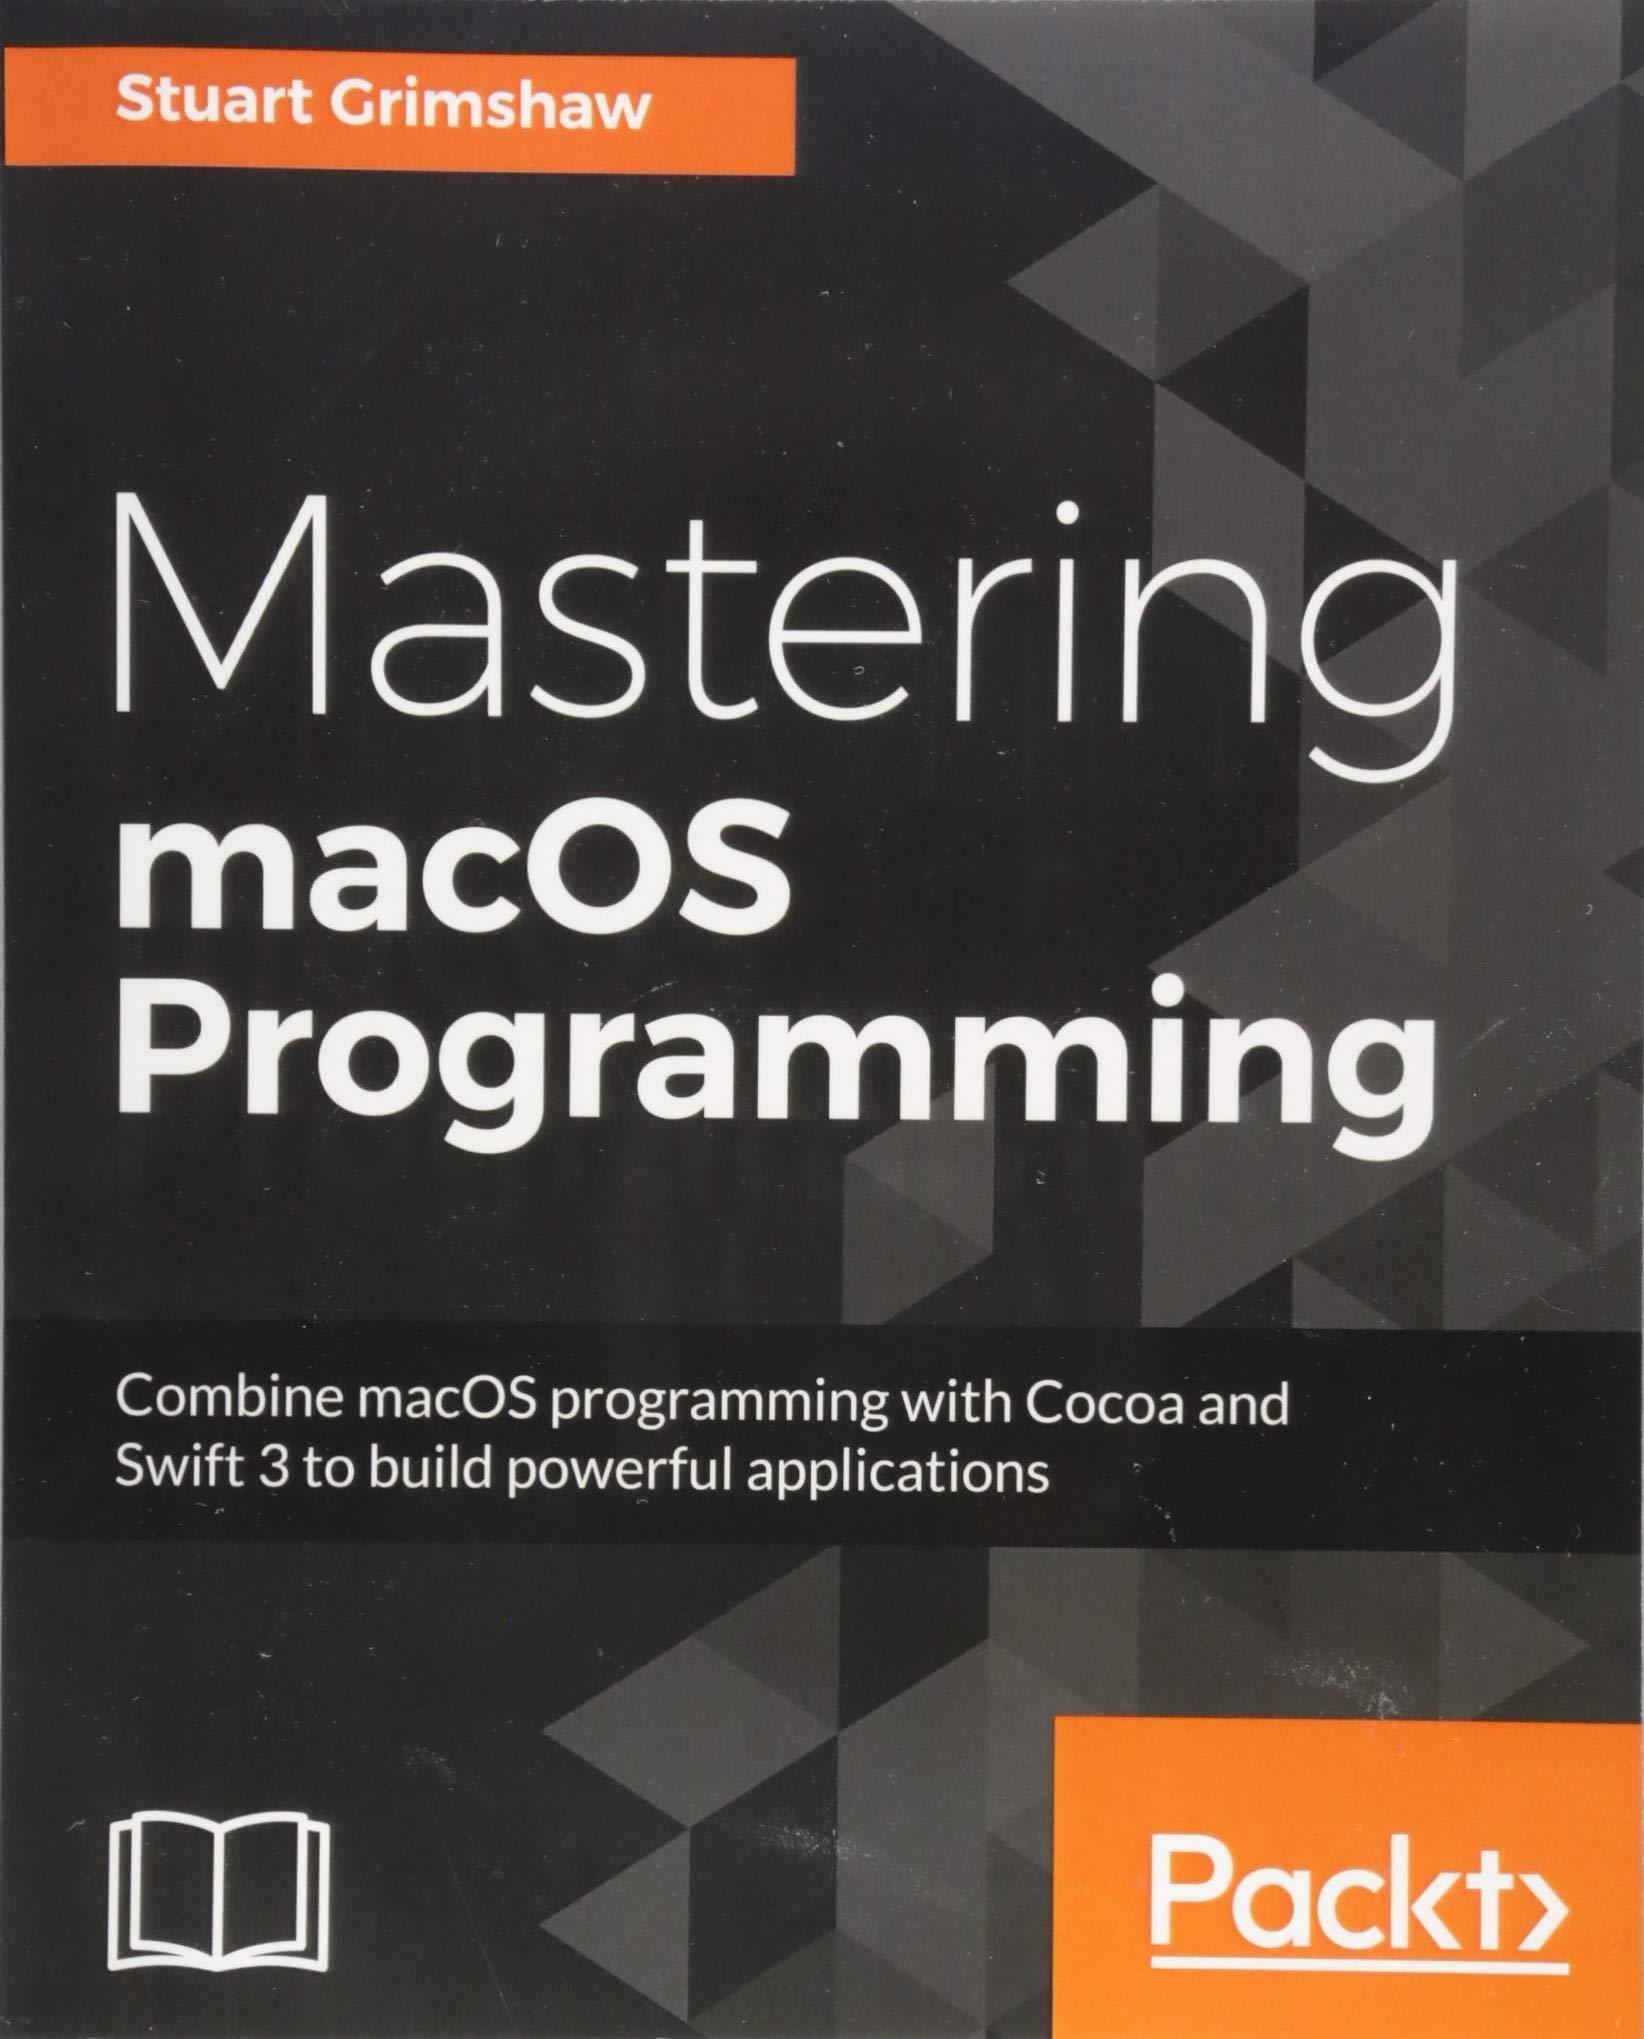 Programming Ski Reading Unix Manual Pages – Meta Morphoz